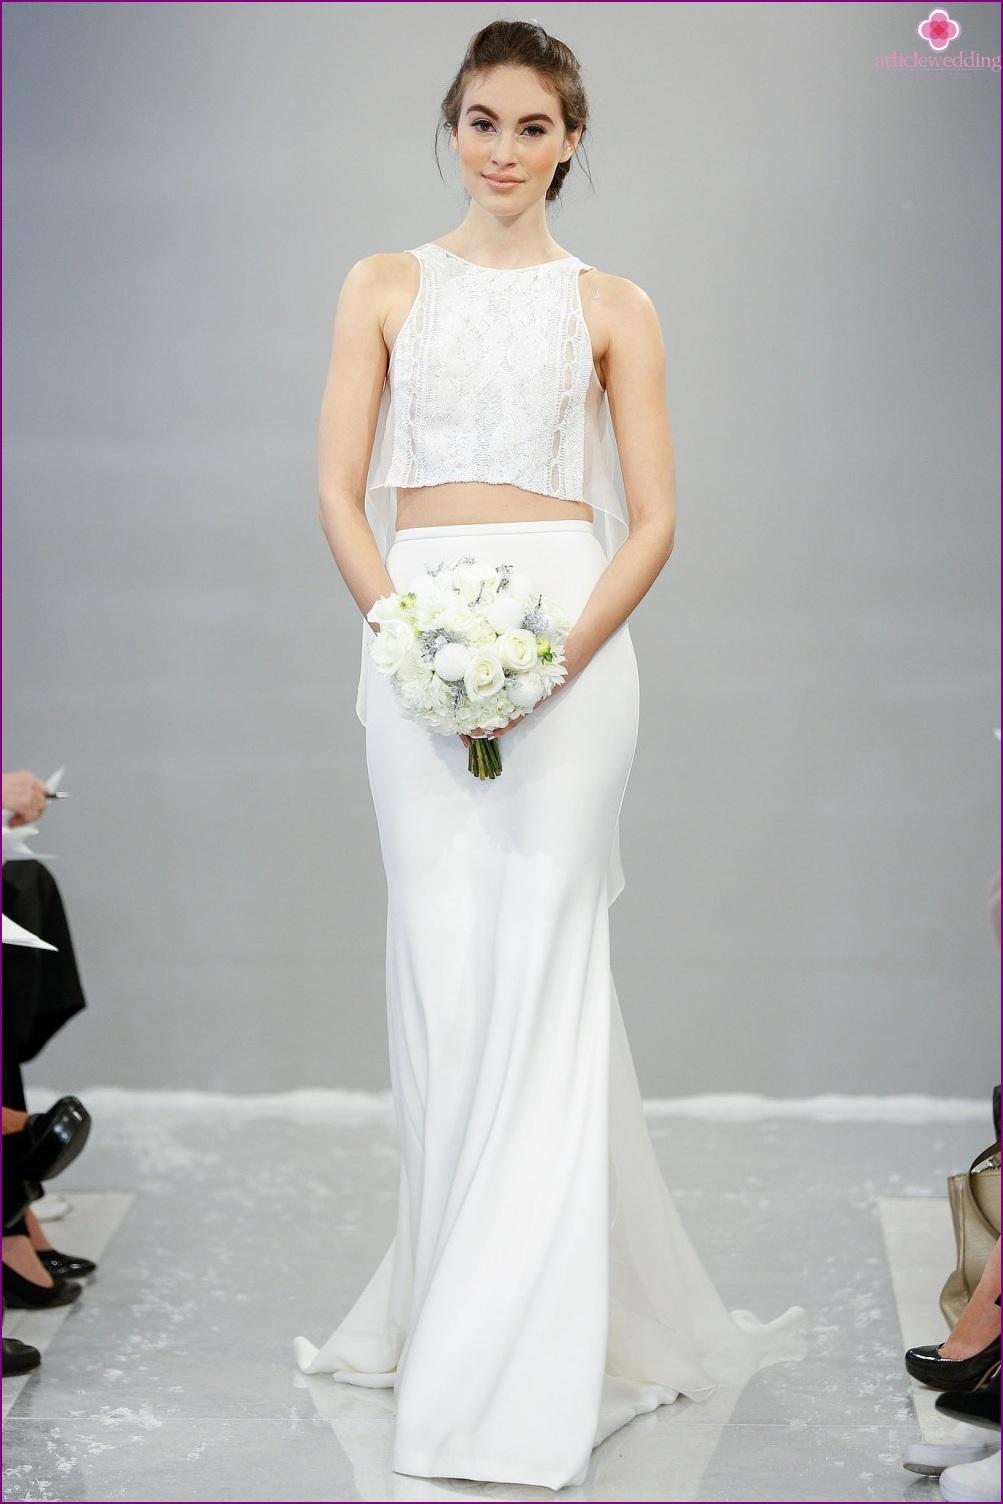 Seperate wedding dress